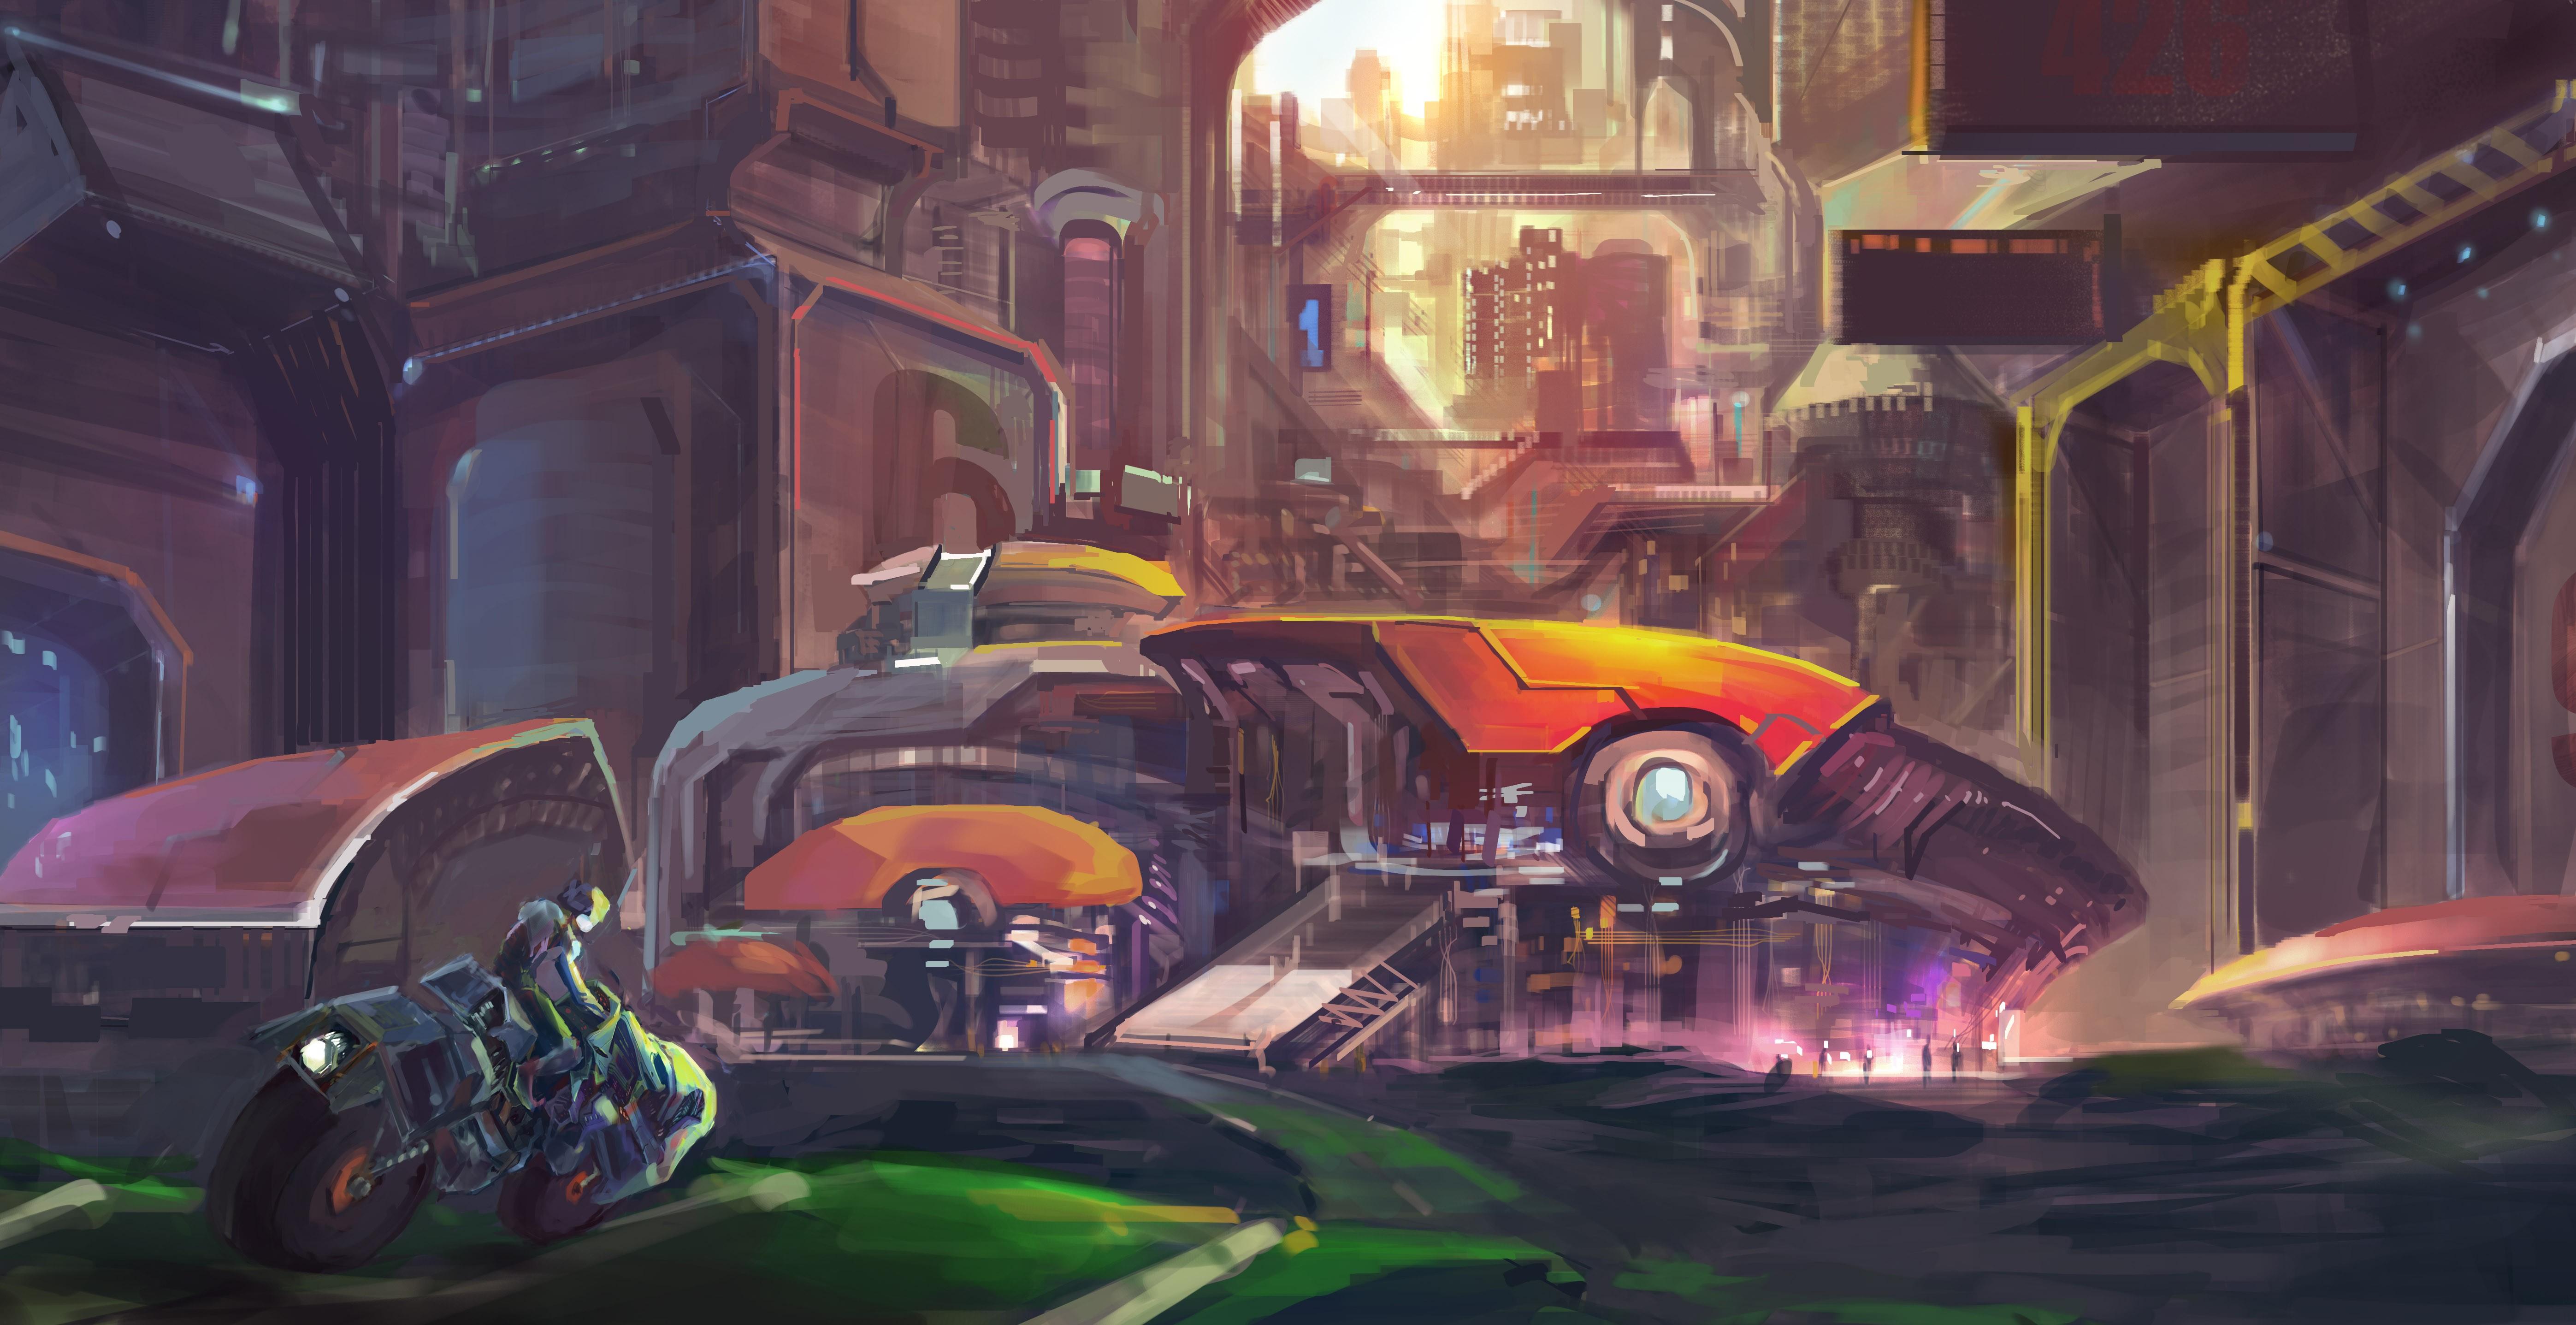 General 5588x2874 futuristic city artwork